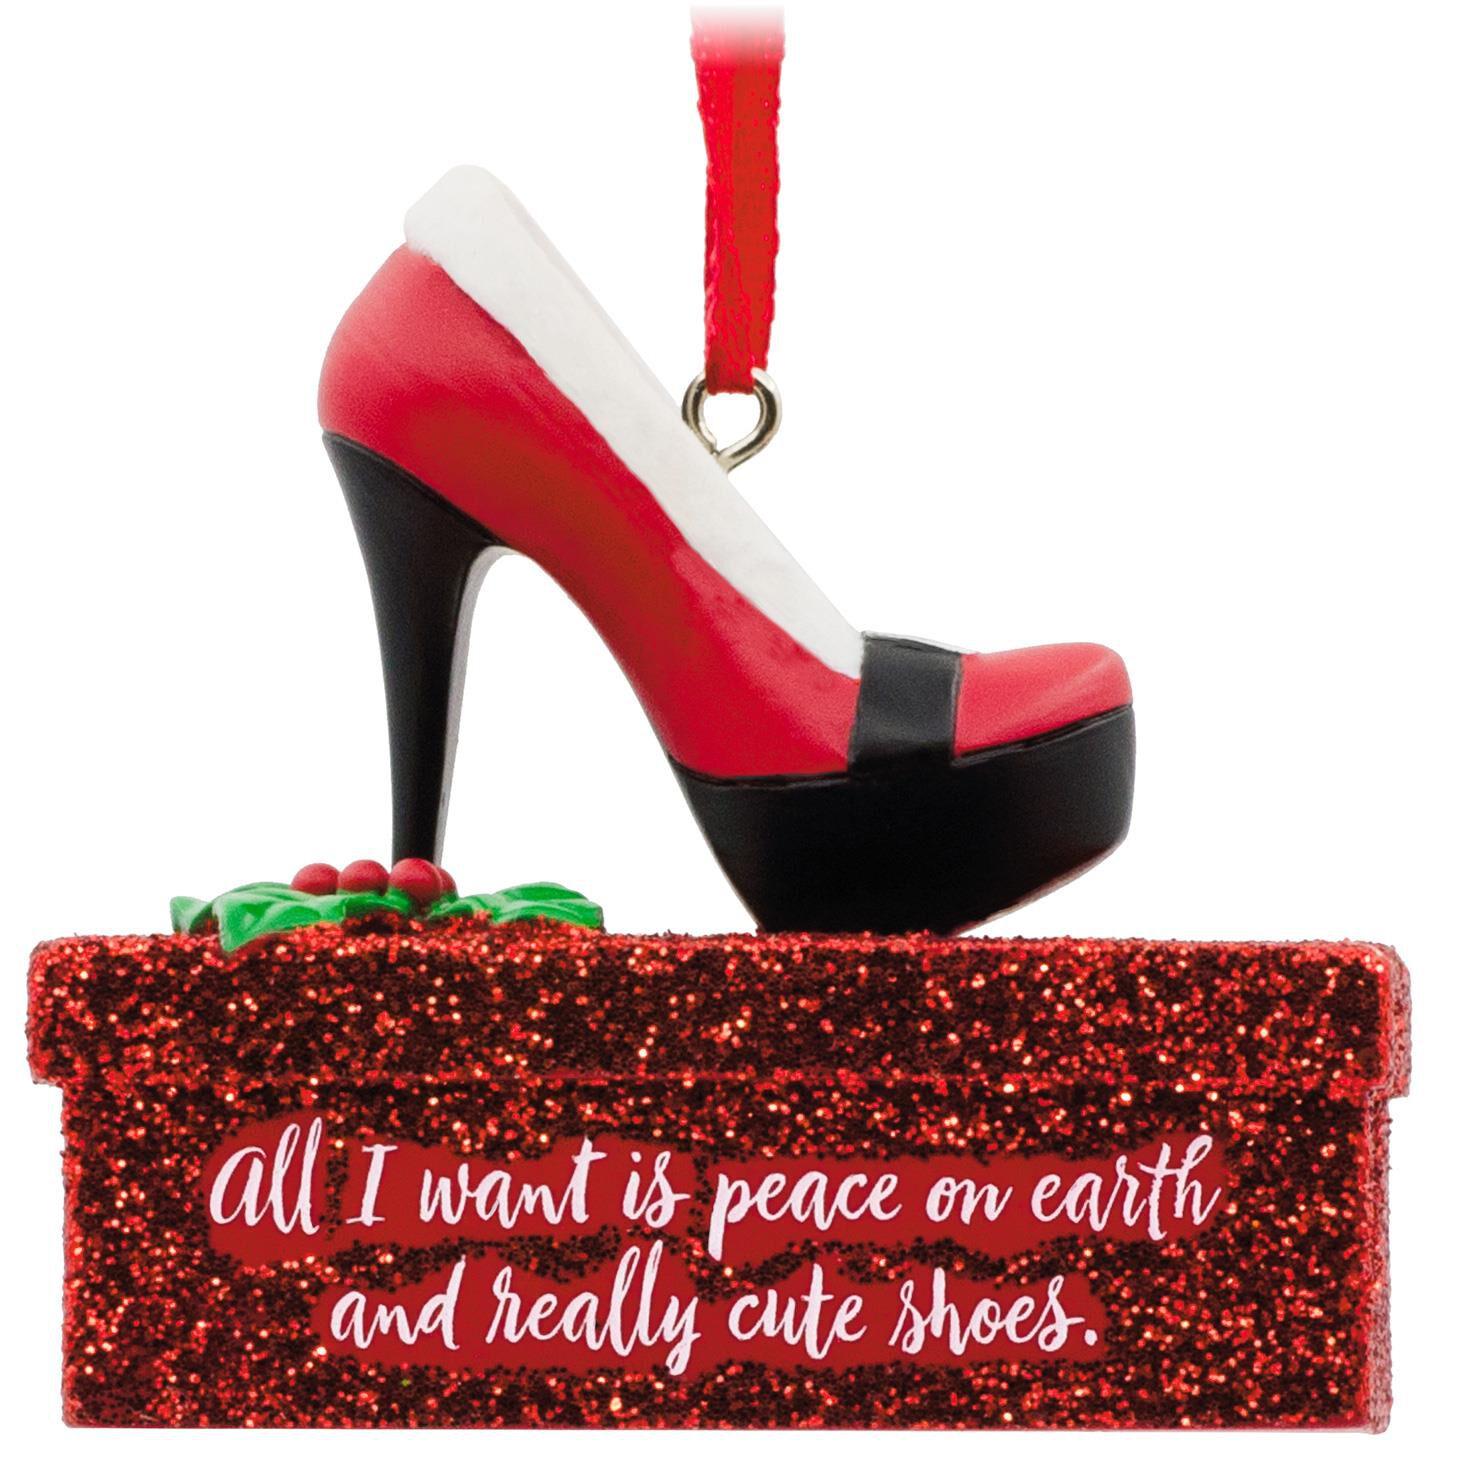 e010b3efea9c Santa high heel shoe hallmark ornament gift ornaments hallmark jpg  1024x1024 Santa heels